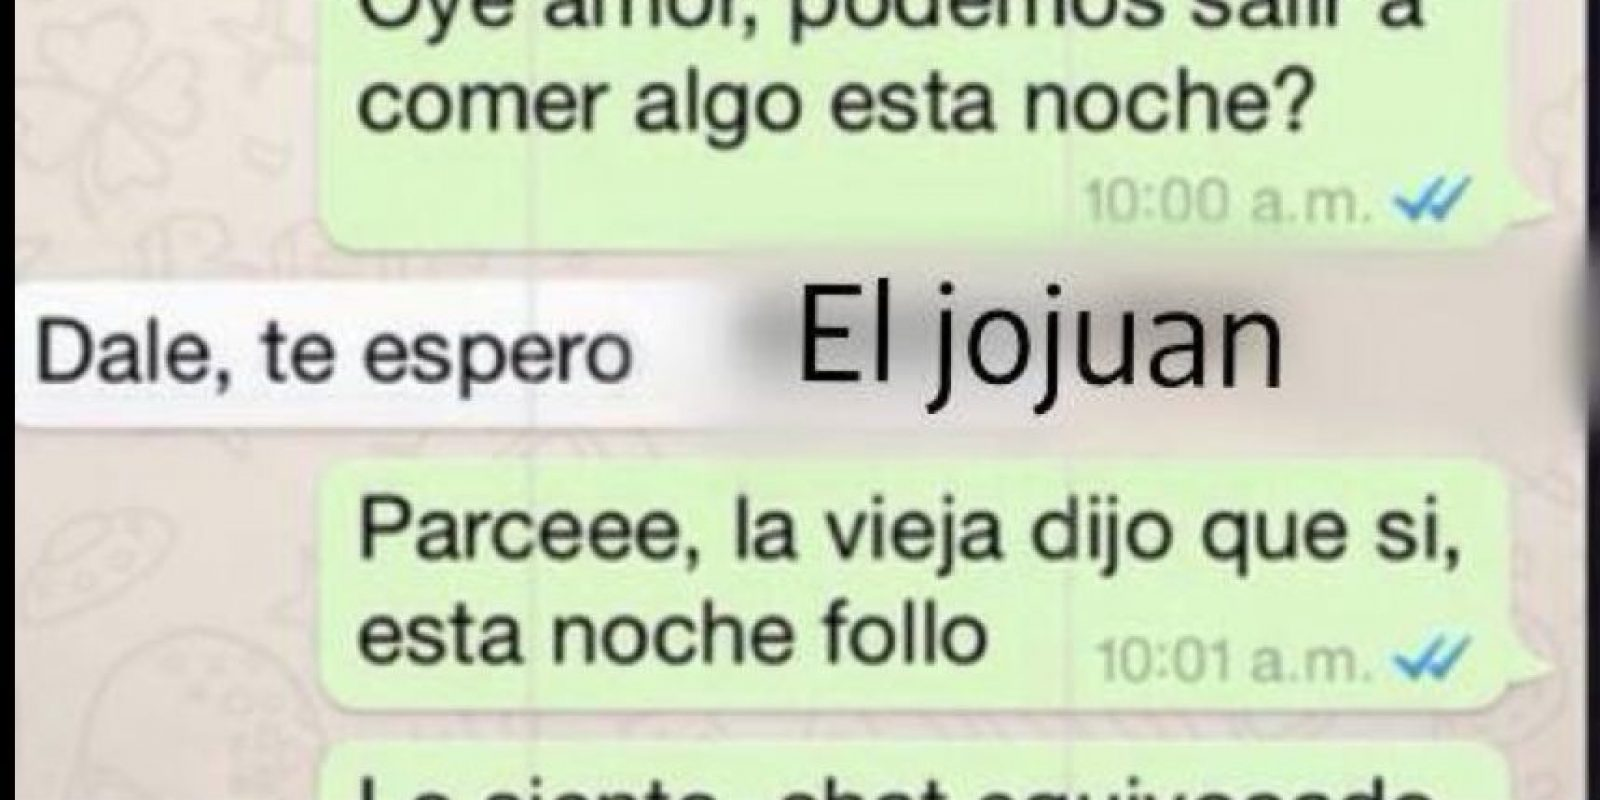 Chat equivocado. Foto:El jojuan/Oigan a esta boba/Facebook